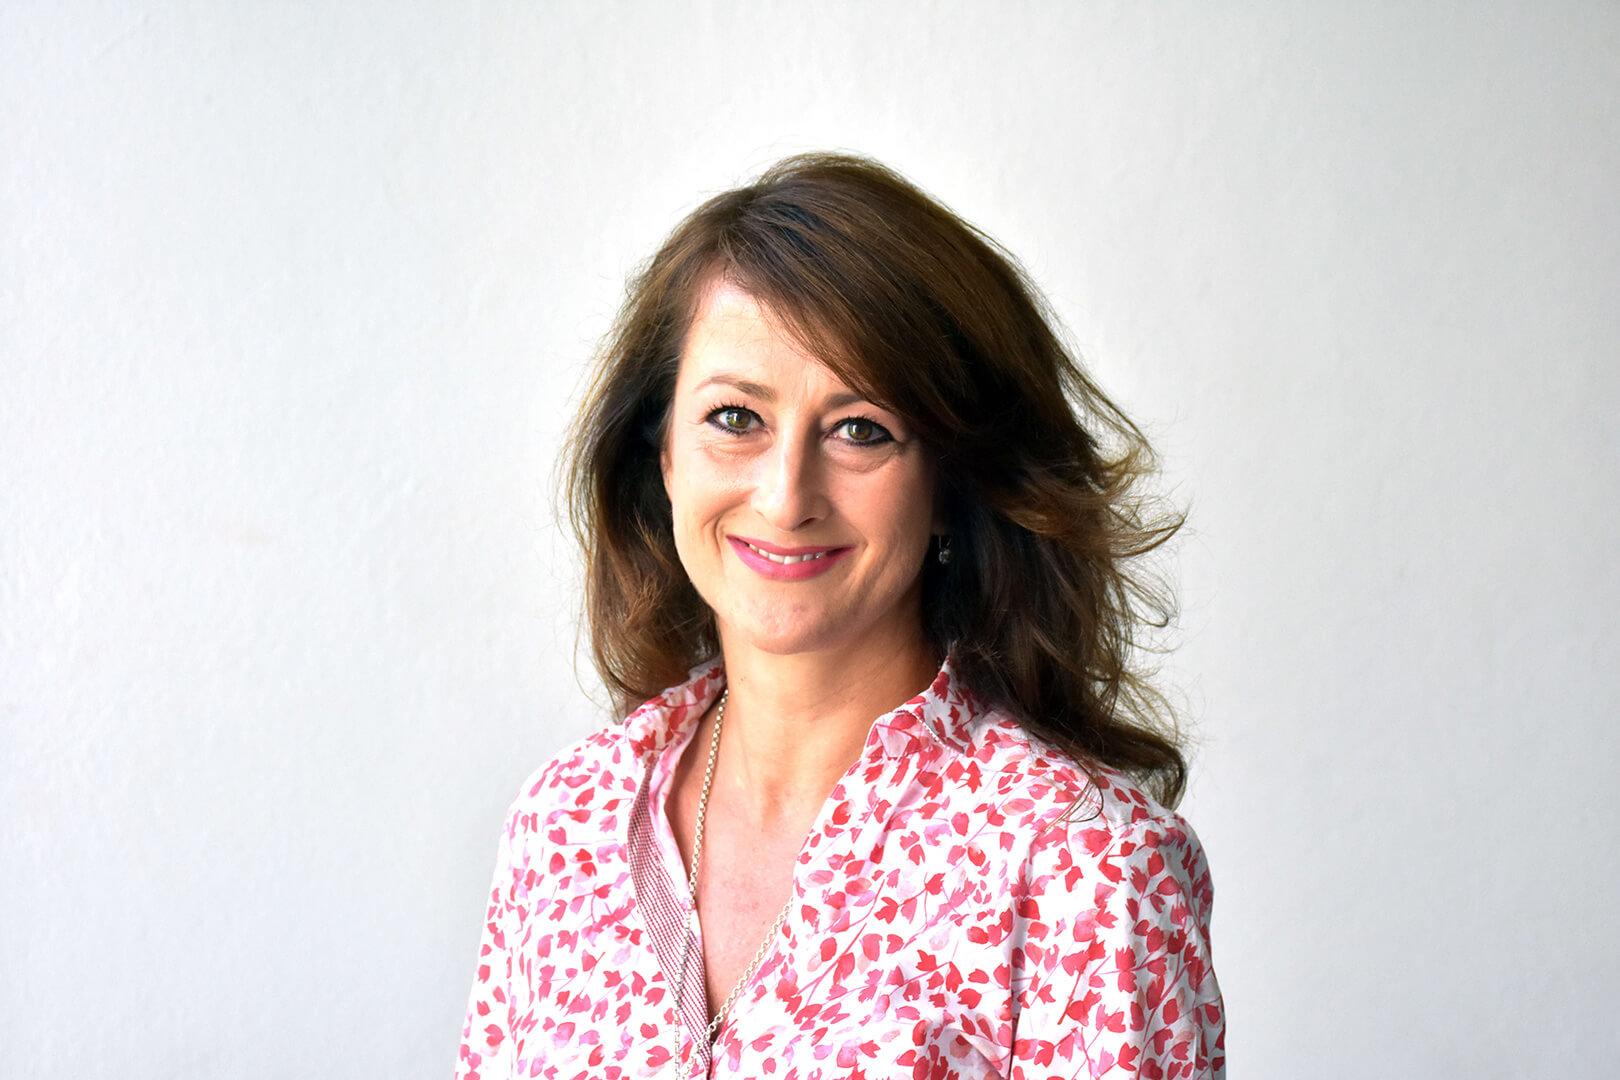 Franziska Müller